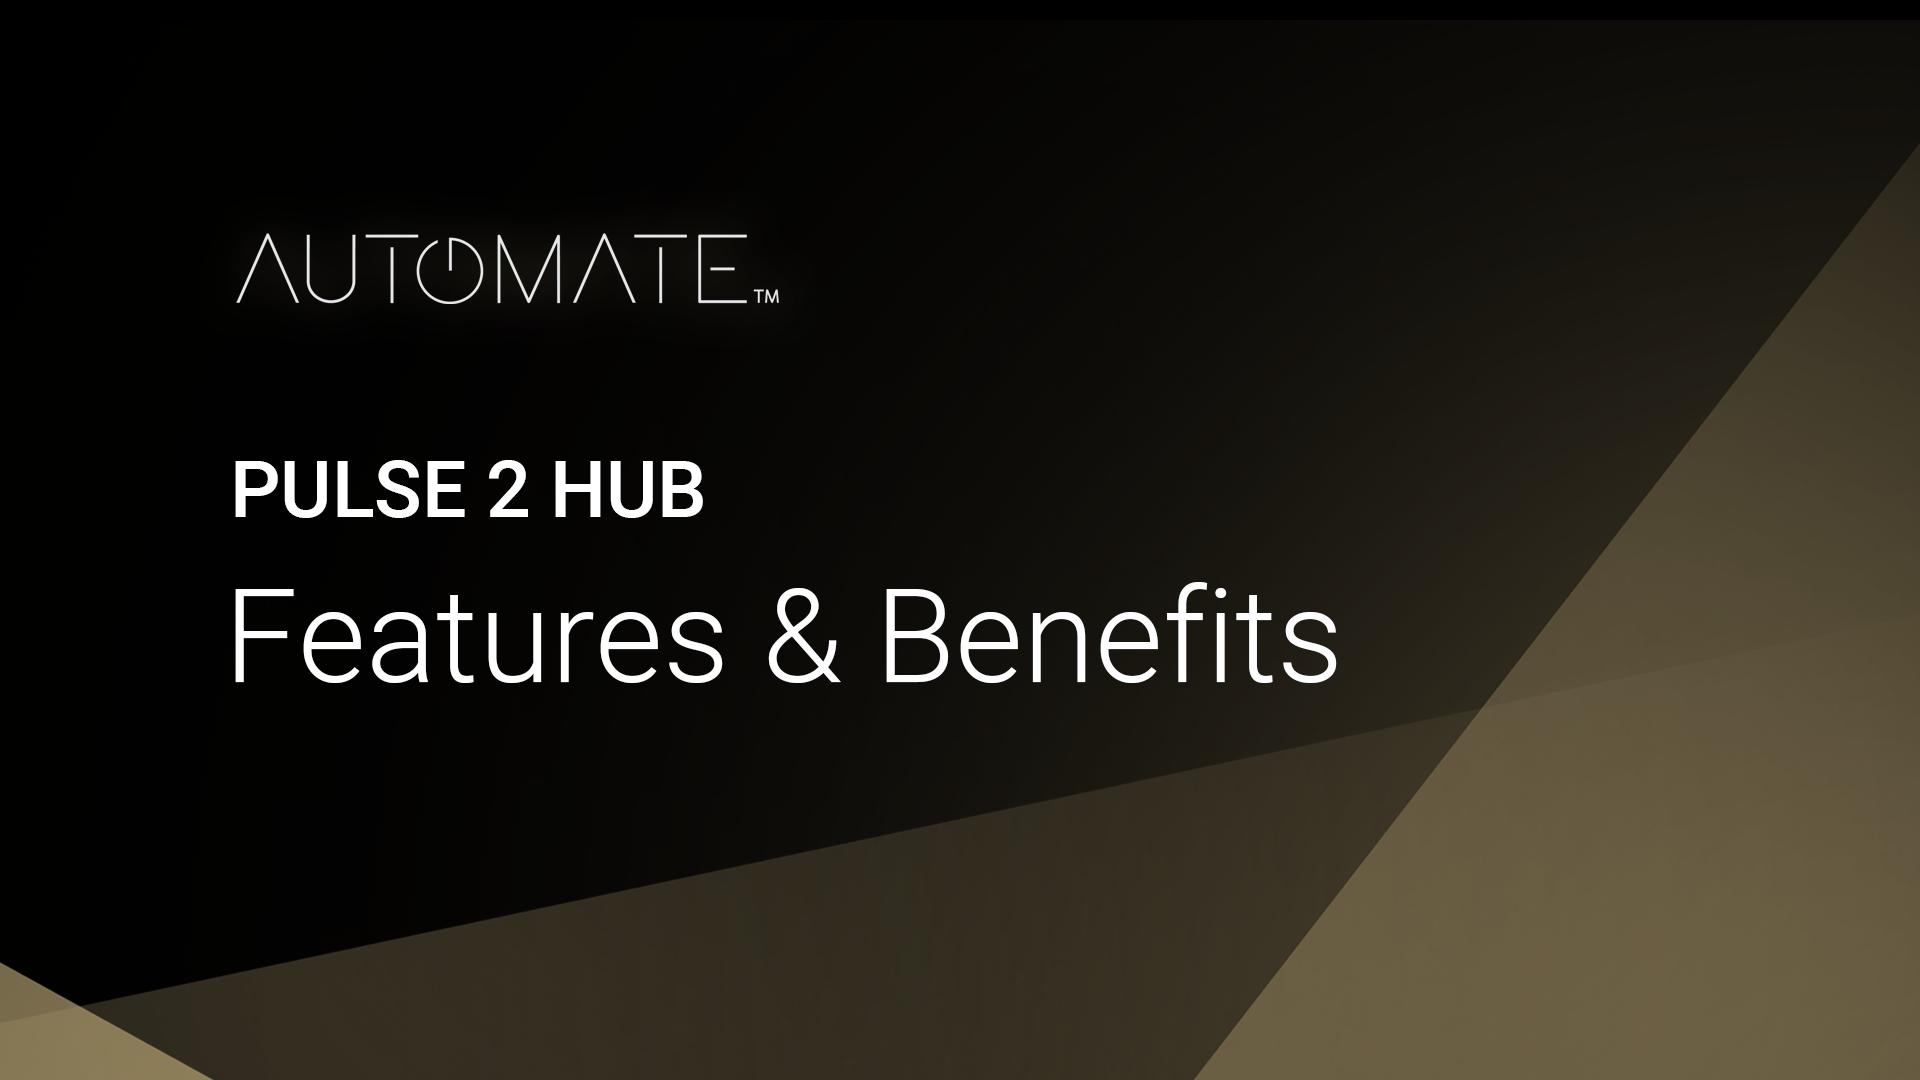 Pulse 2 Hub Features & Benefits